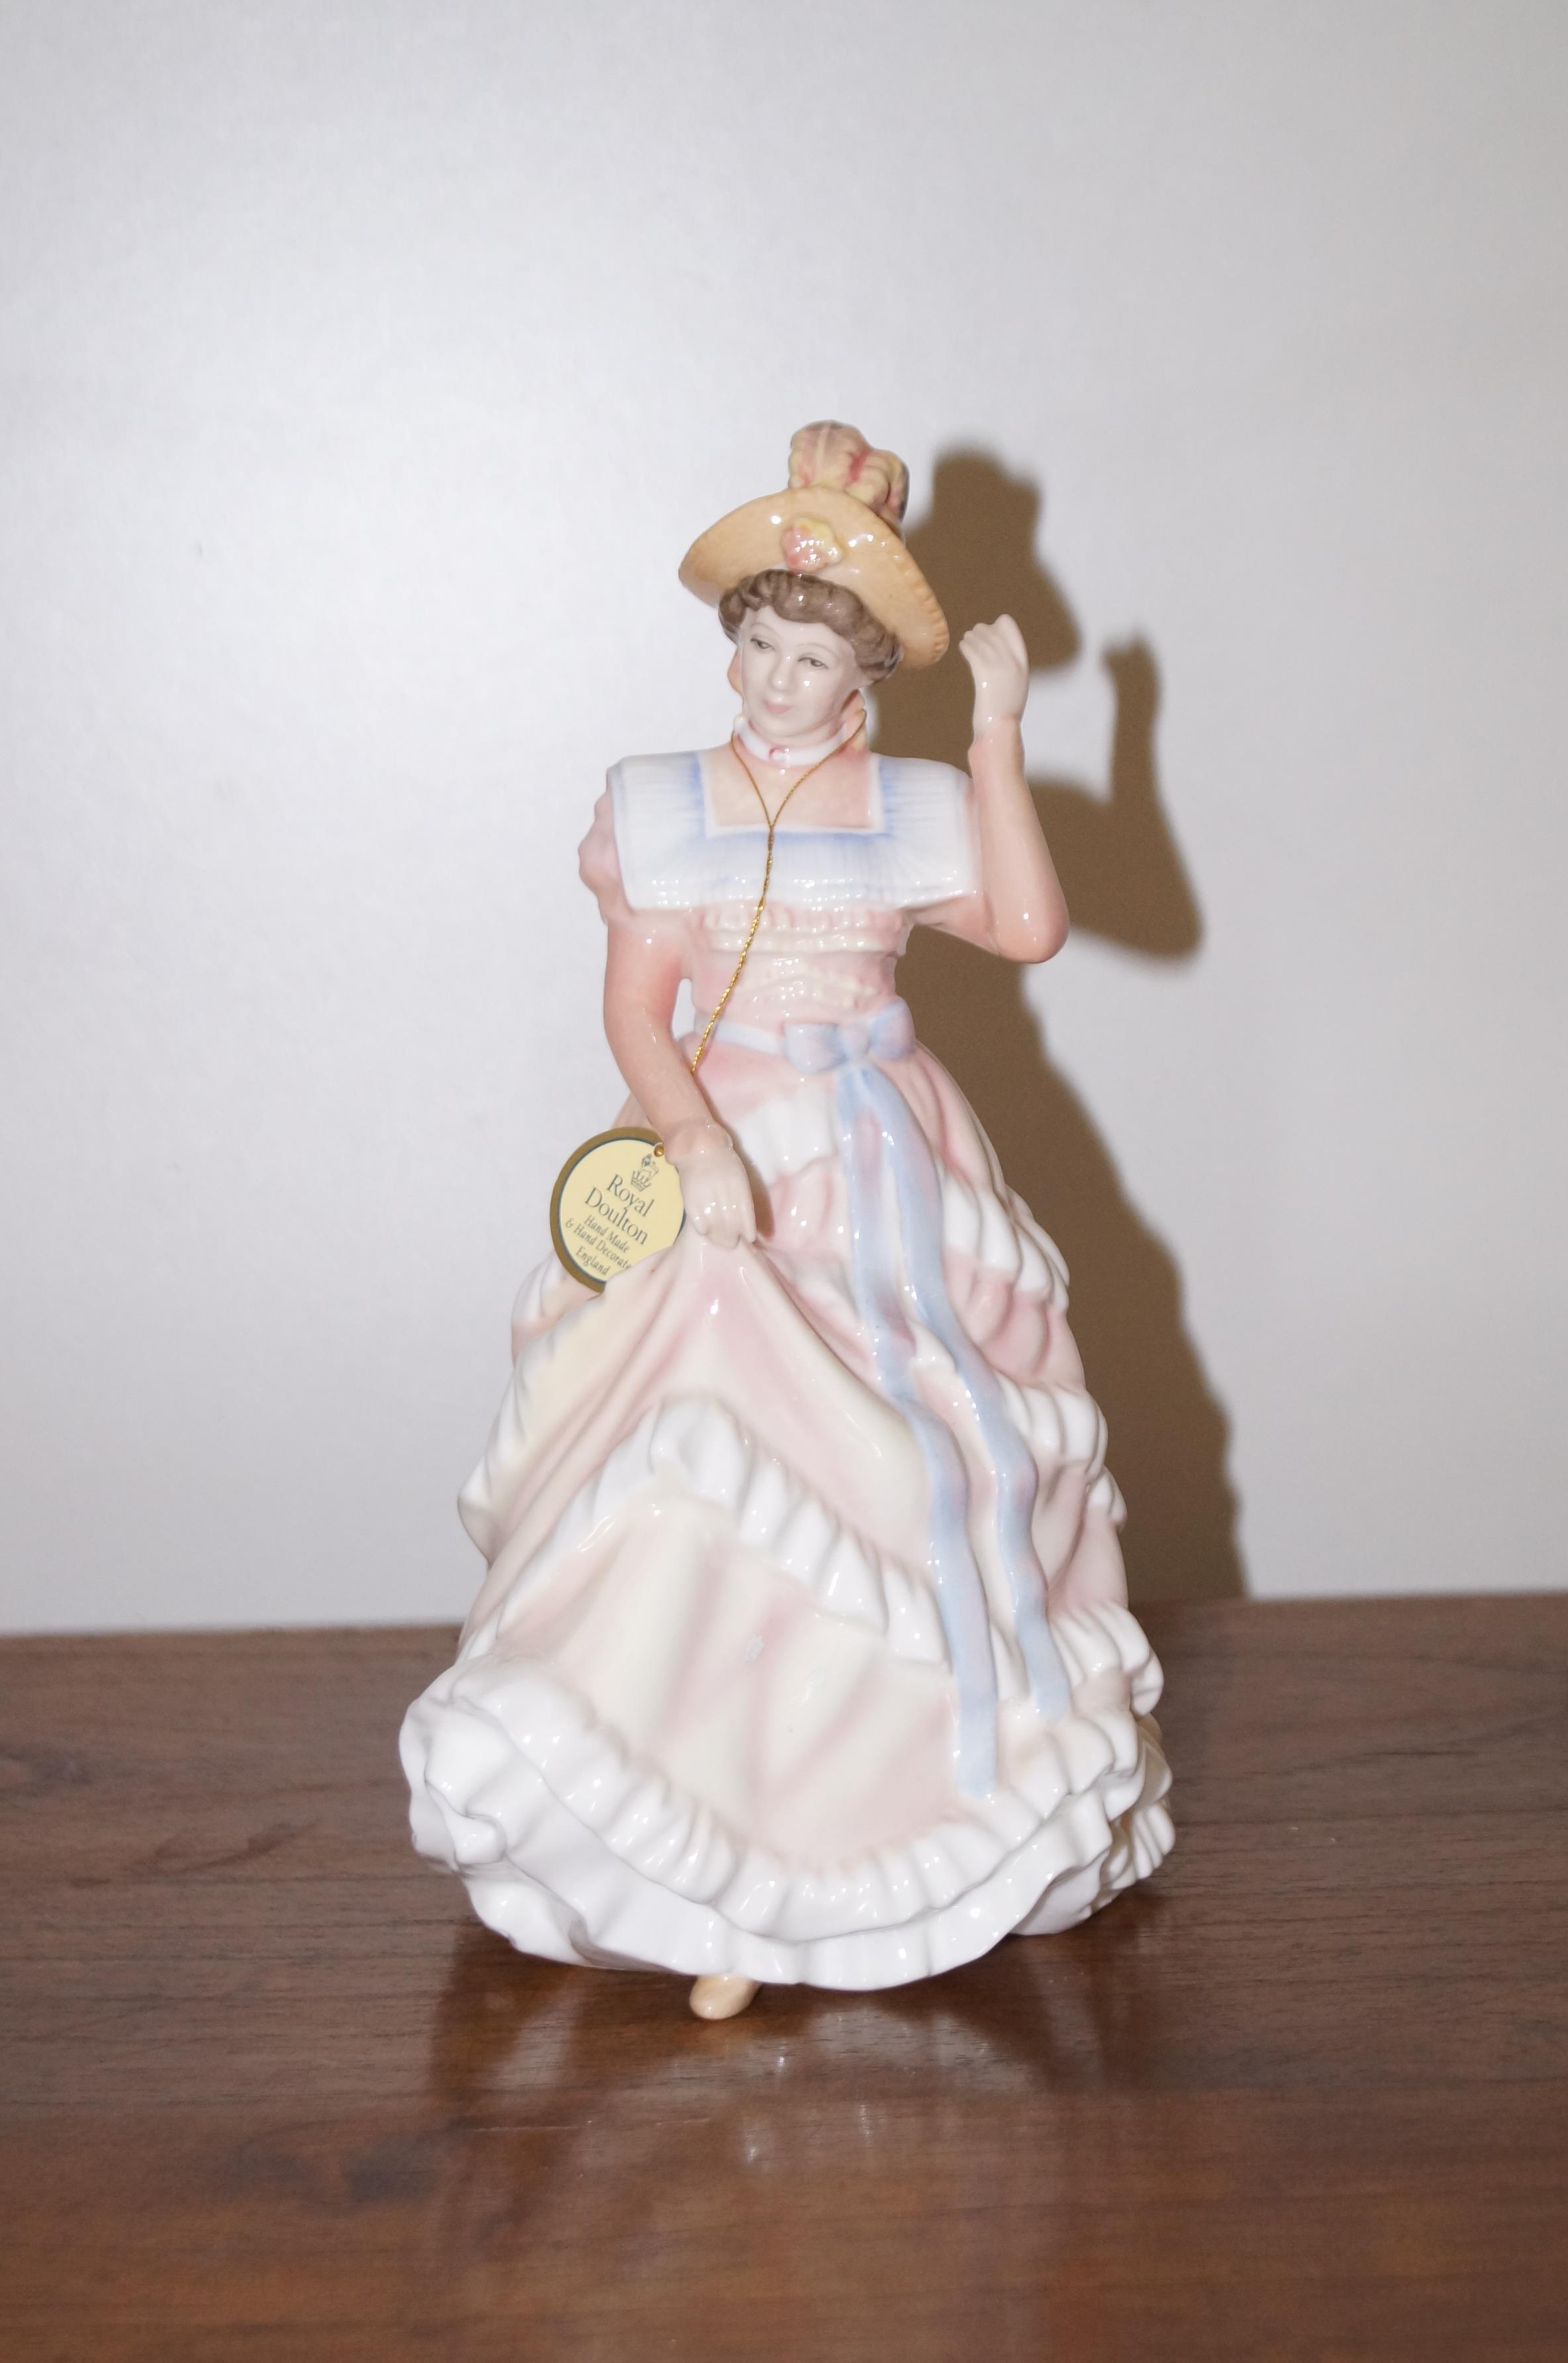 Royal Doulton Figurine (Sharon) 1994 Figurine of t